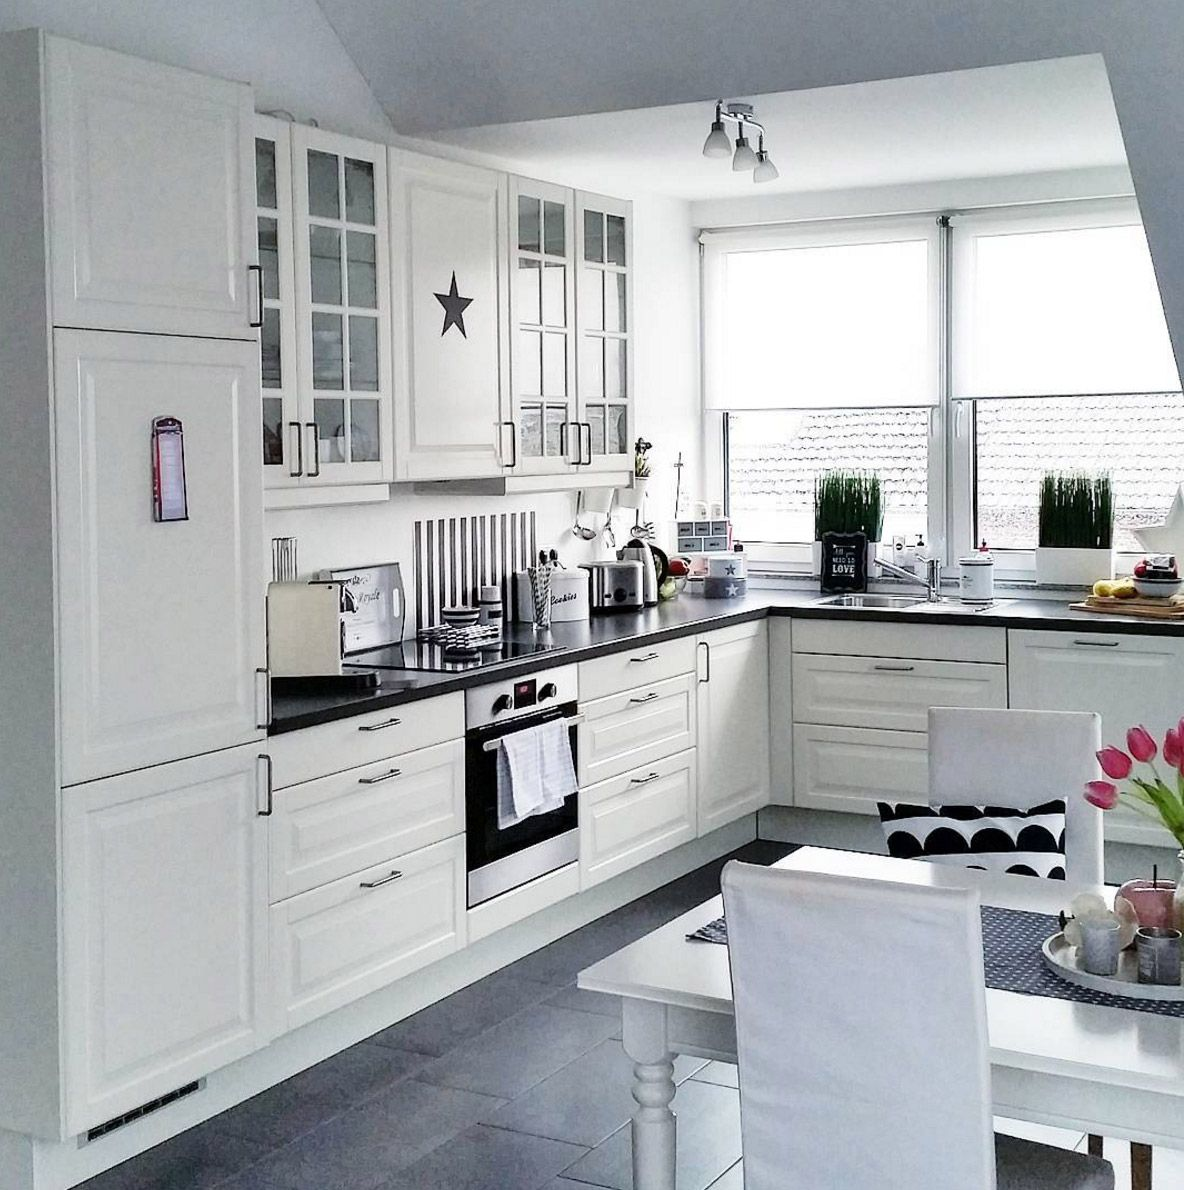 Rollo Küche Ikea | Dachfenster Gardinen Ikea Amuda Me